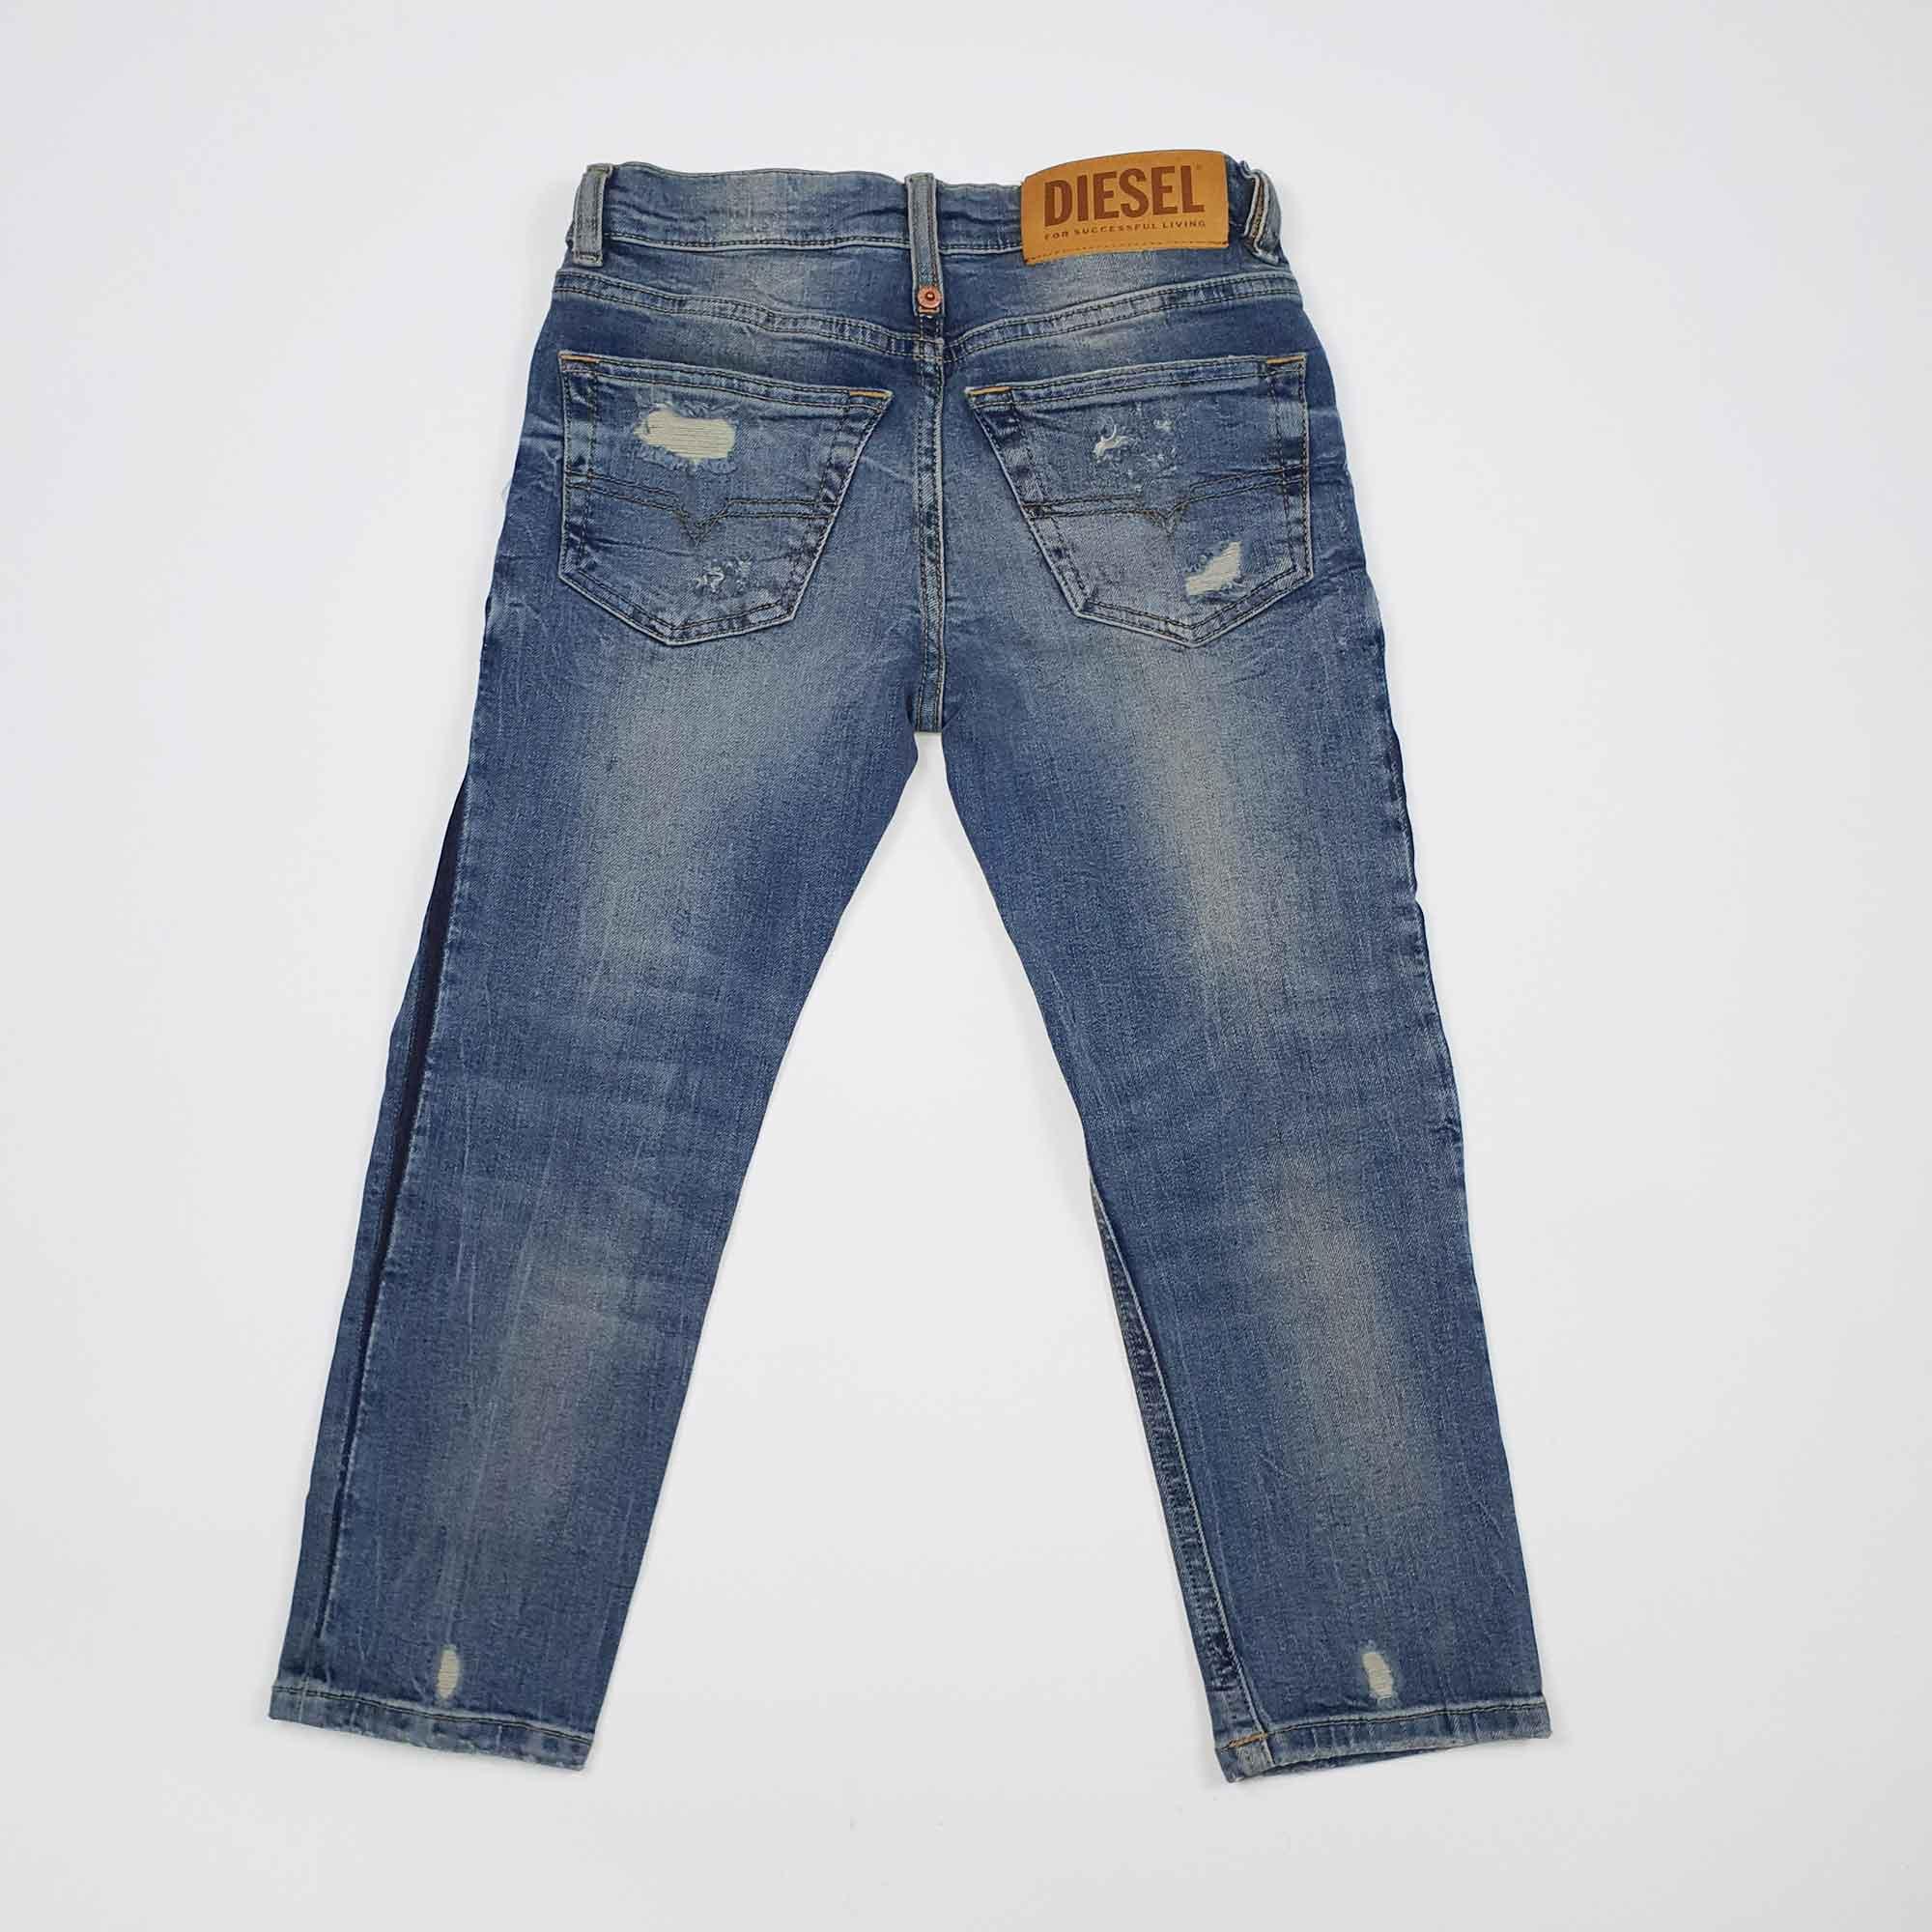 Jeans mharky - Denim